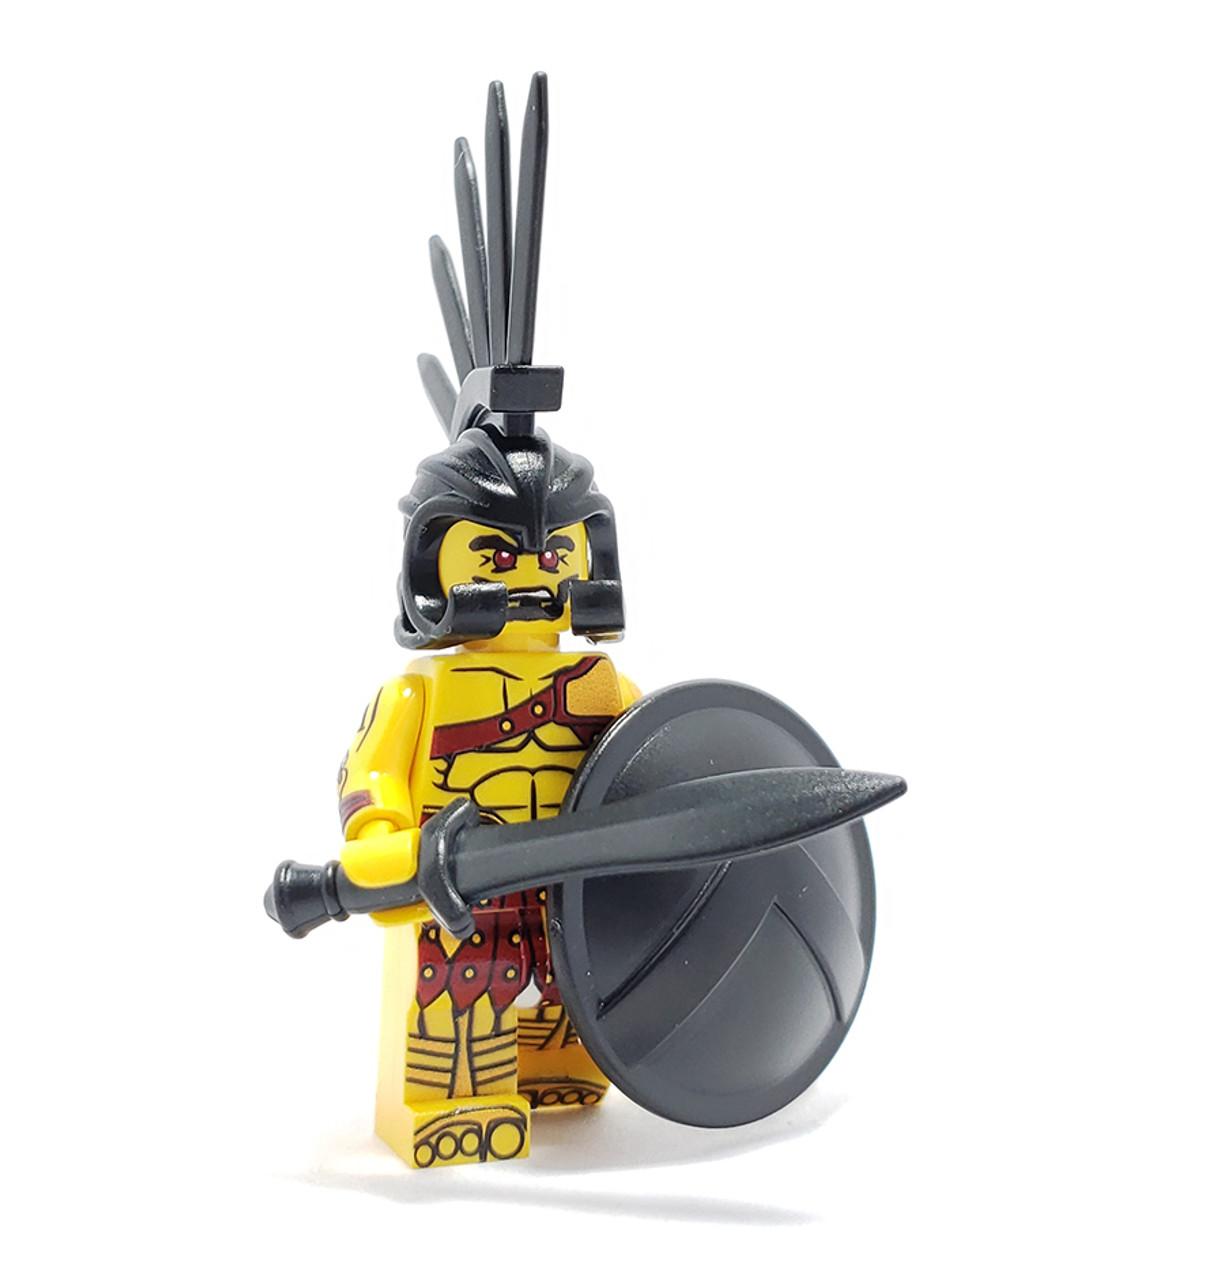 Black Color Lego Custom Samurai General Minifigure Accessory Pack